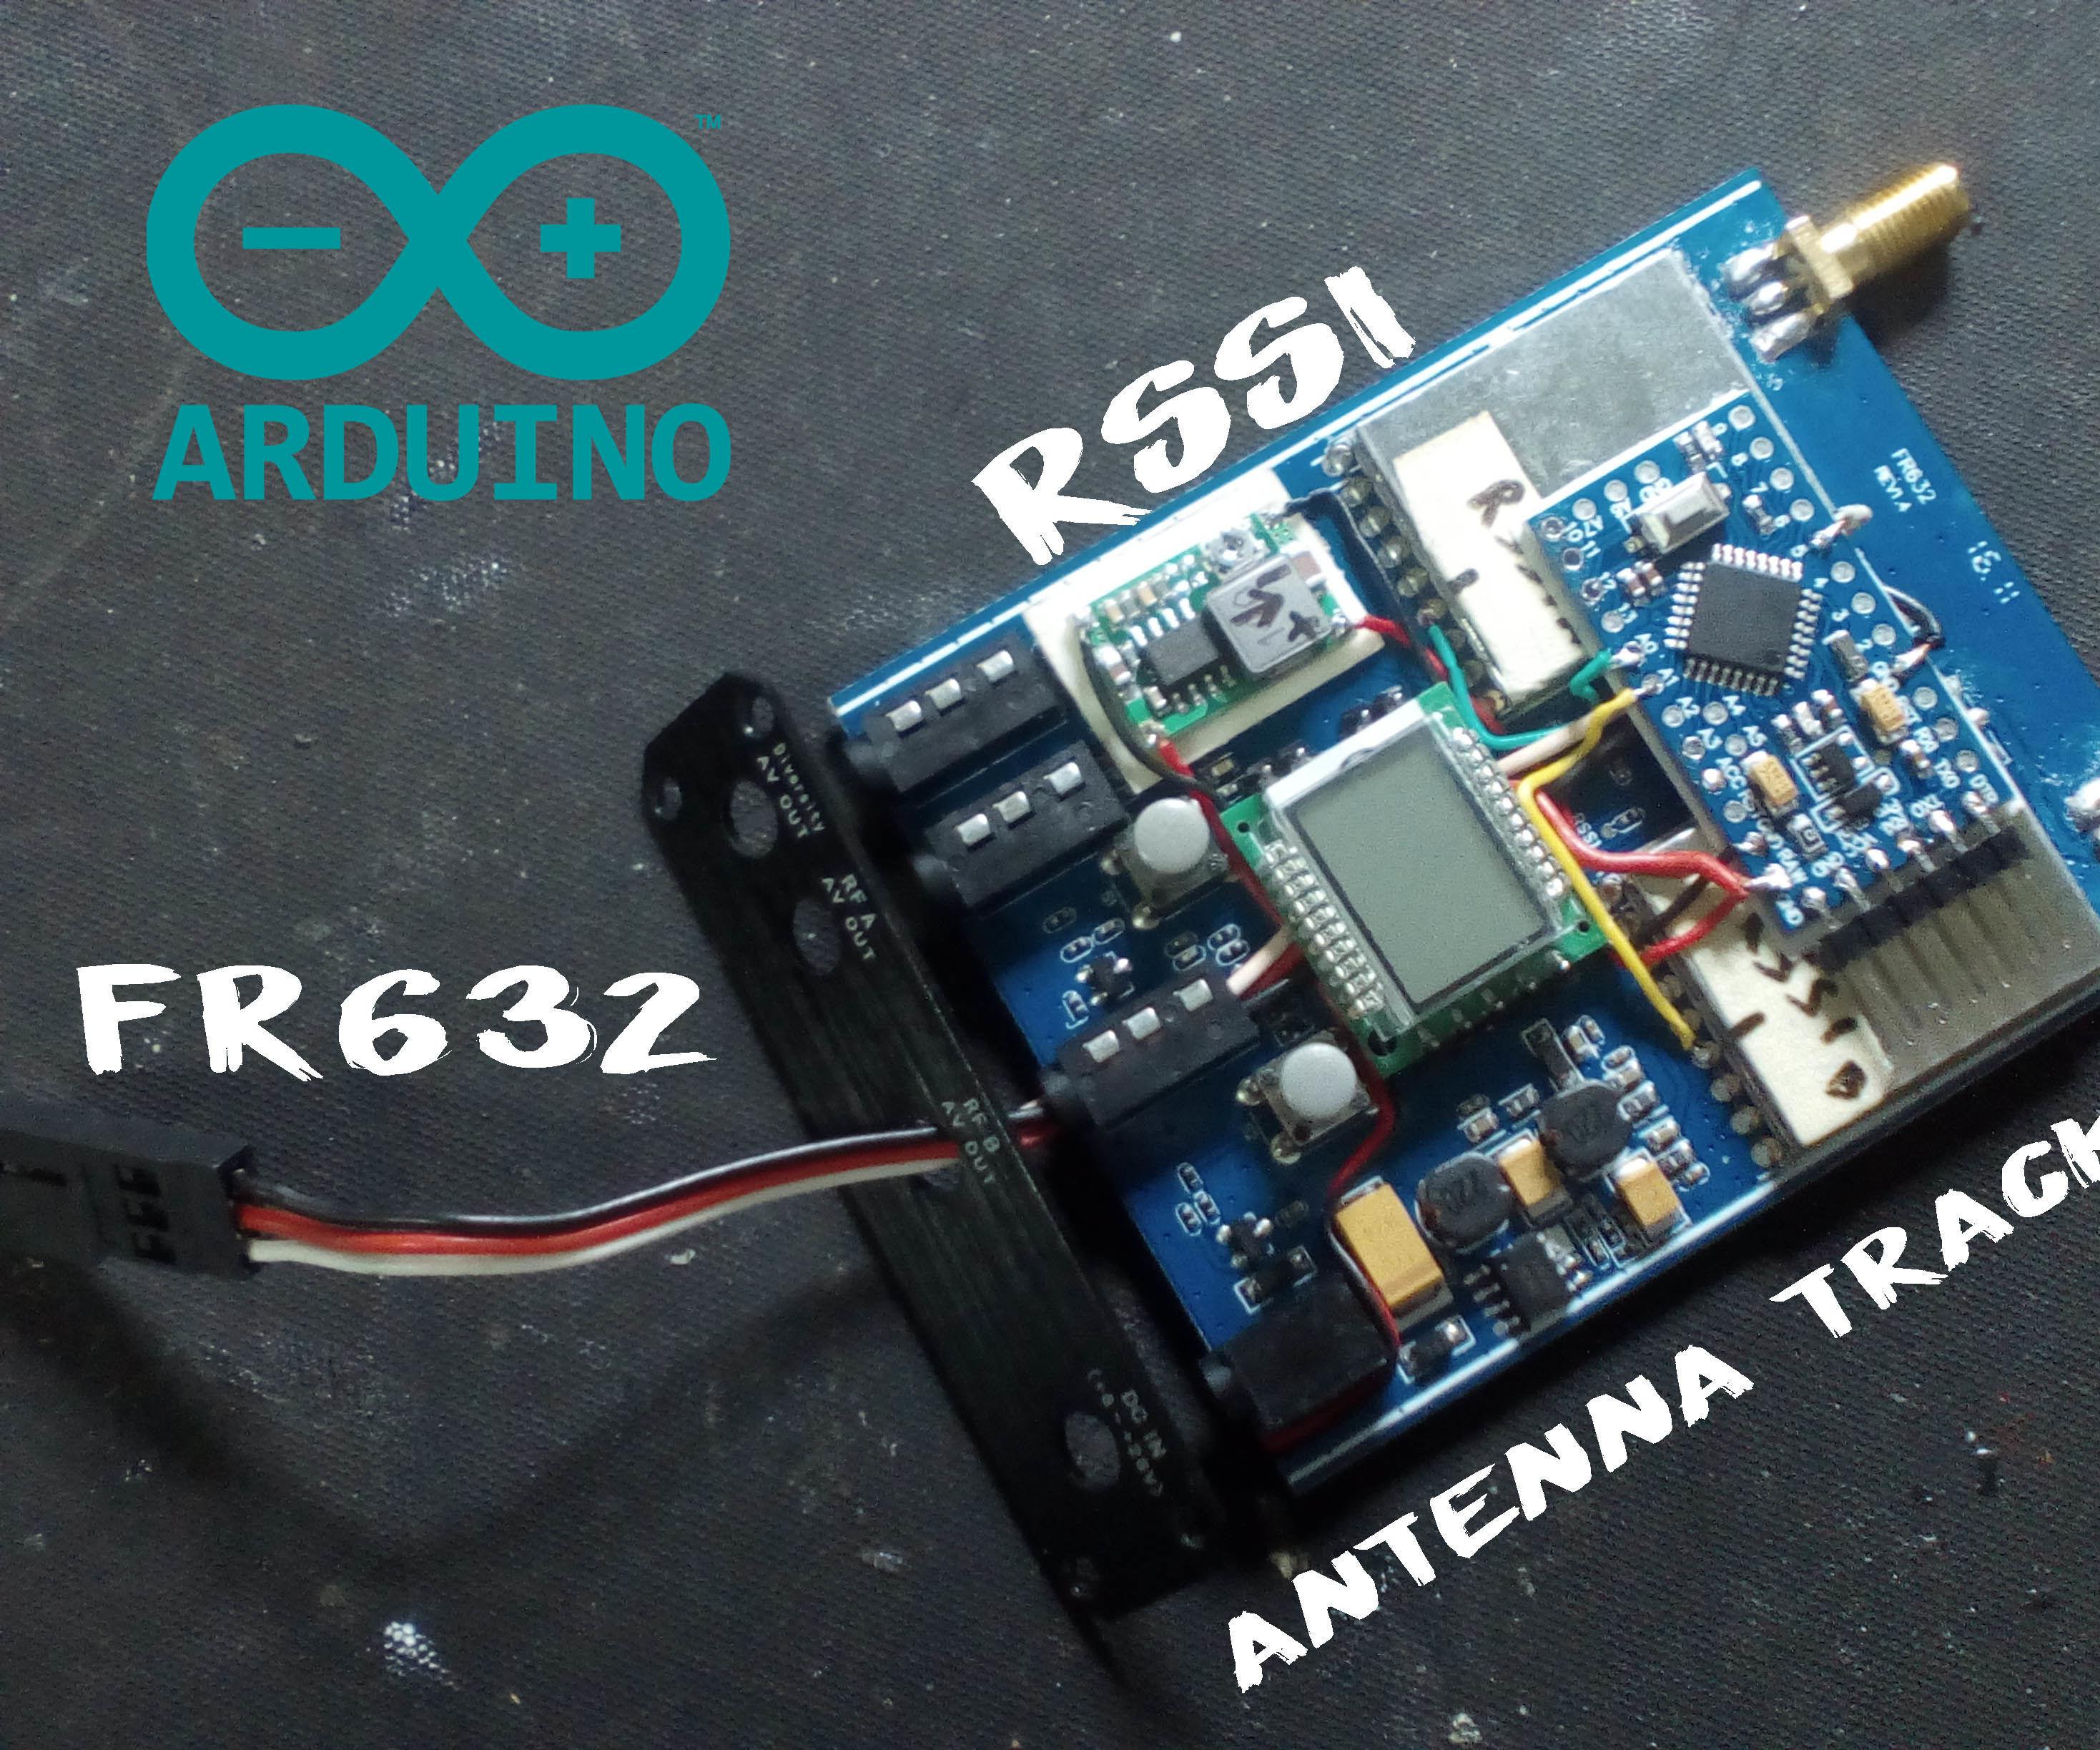 Arduino FR632 RSSI Antenna Tracker: 10 Steps